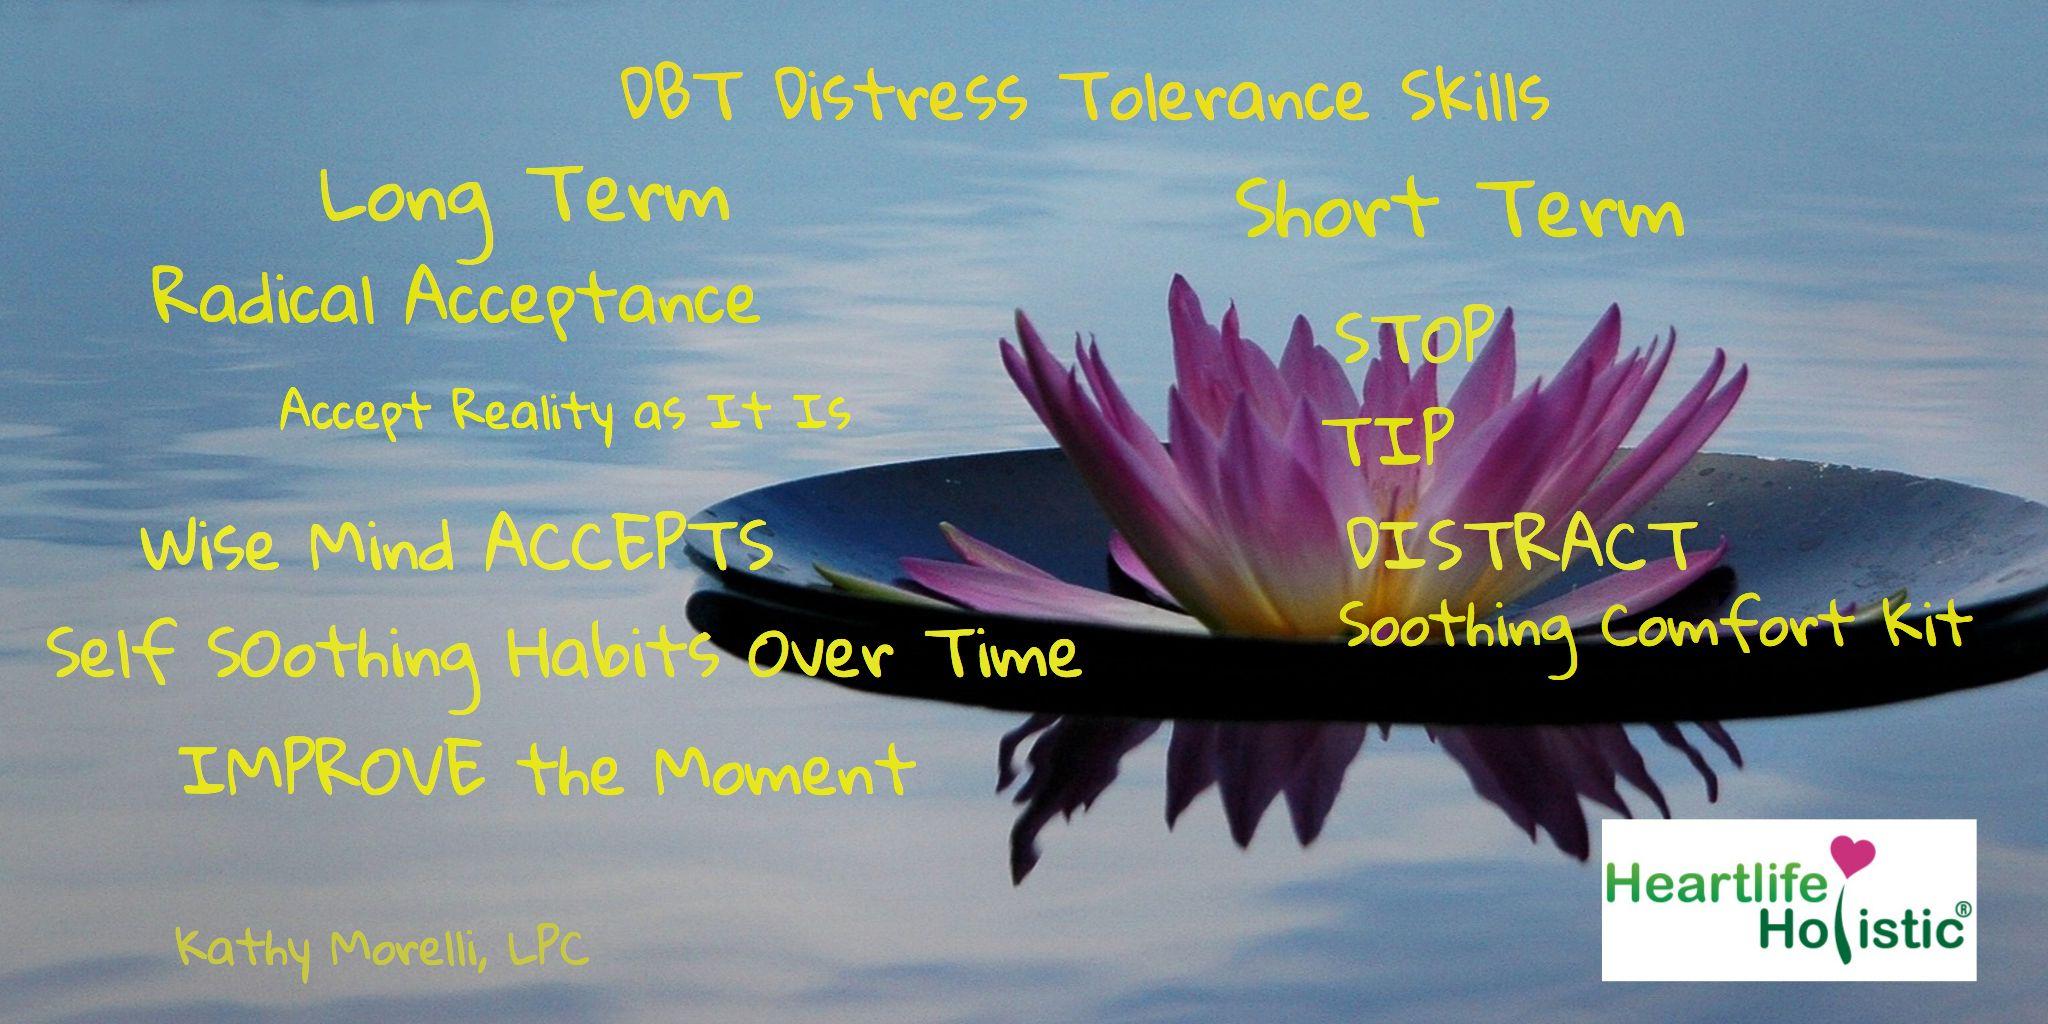 Kathy Morelli Lpc Dbt Distress Tolerance Skills